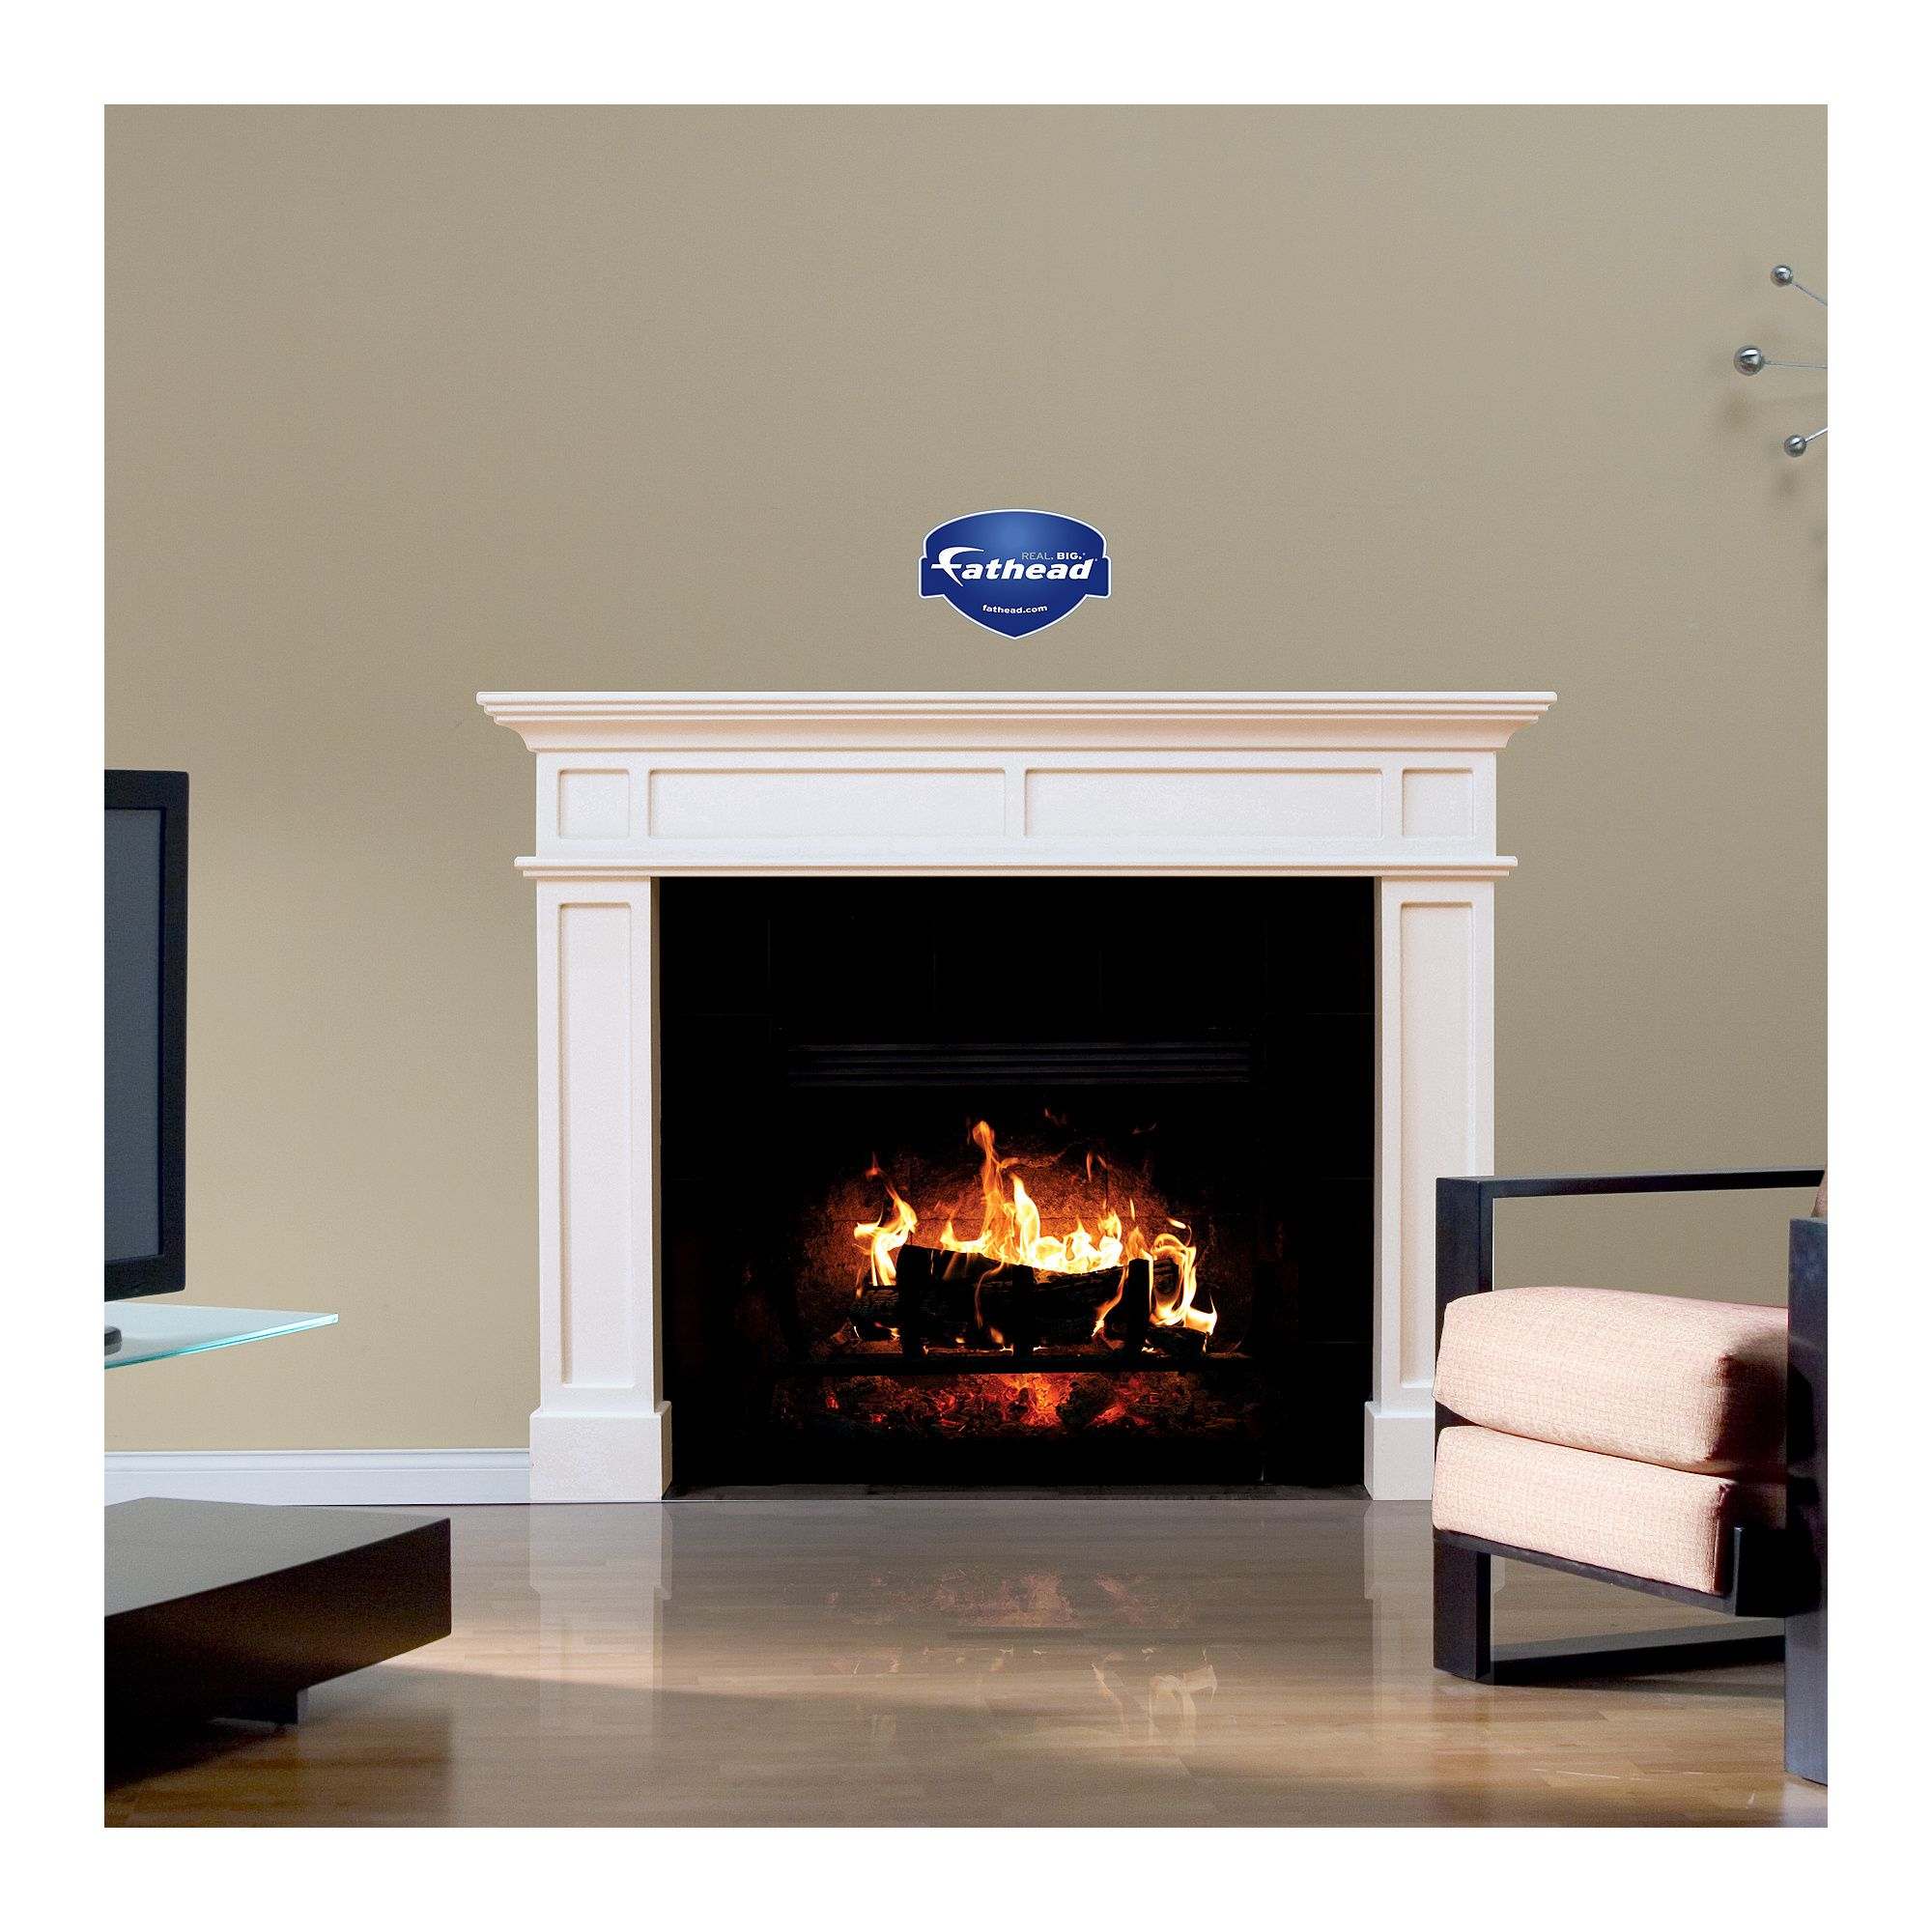 Fireplace Huge Removable Wall Decal Stuff I Plan To Make